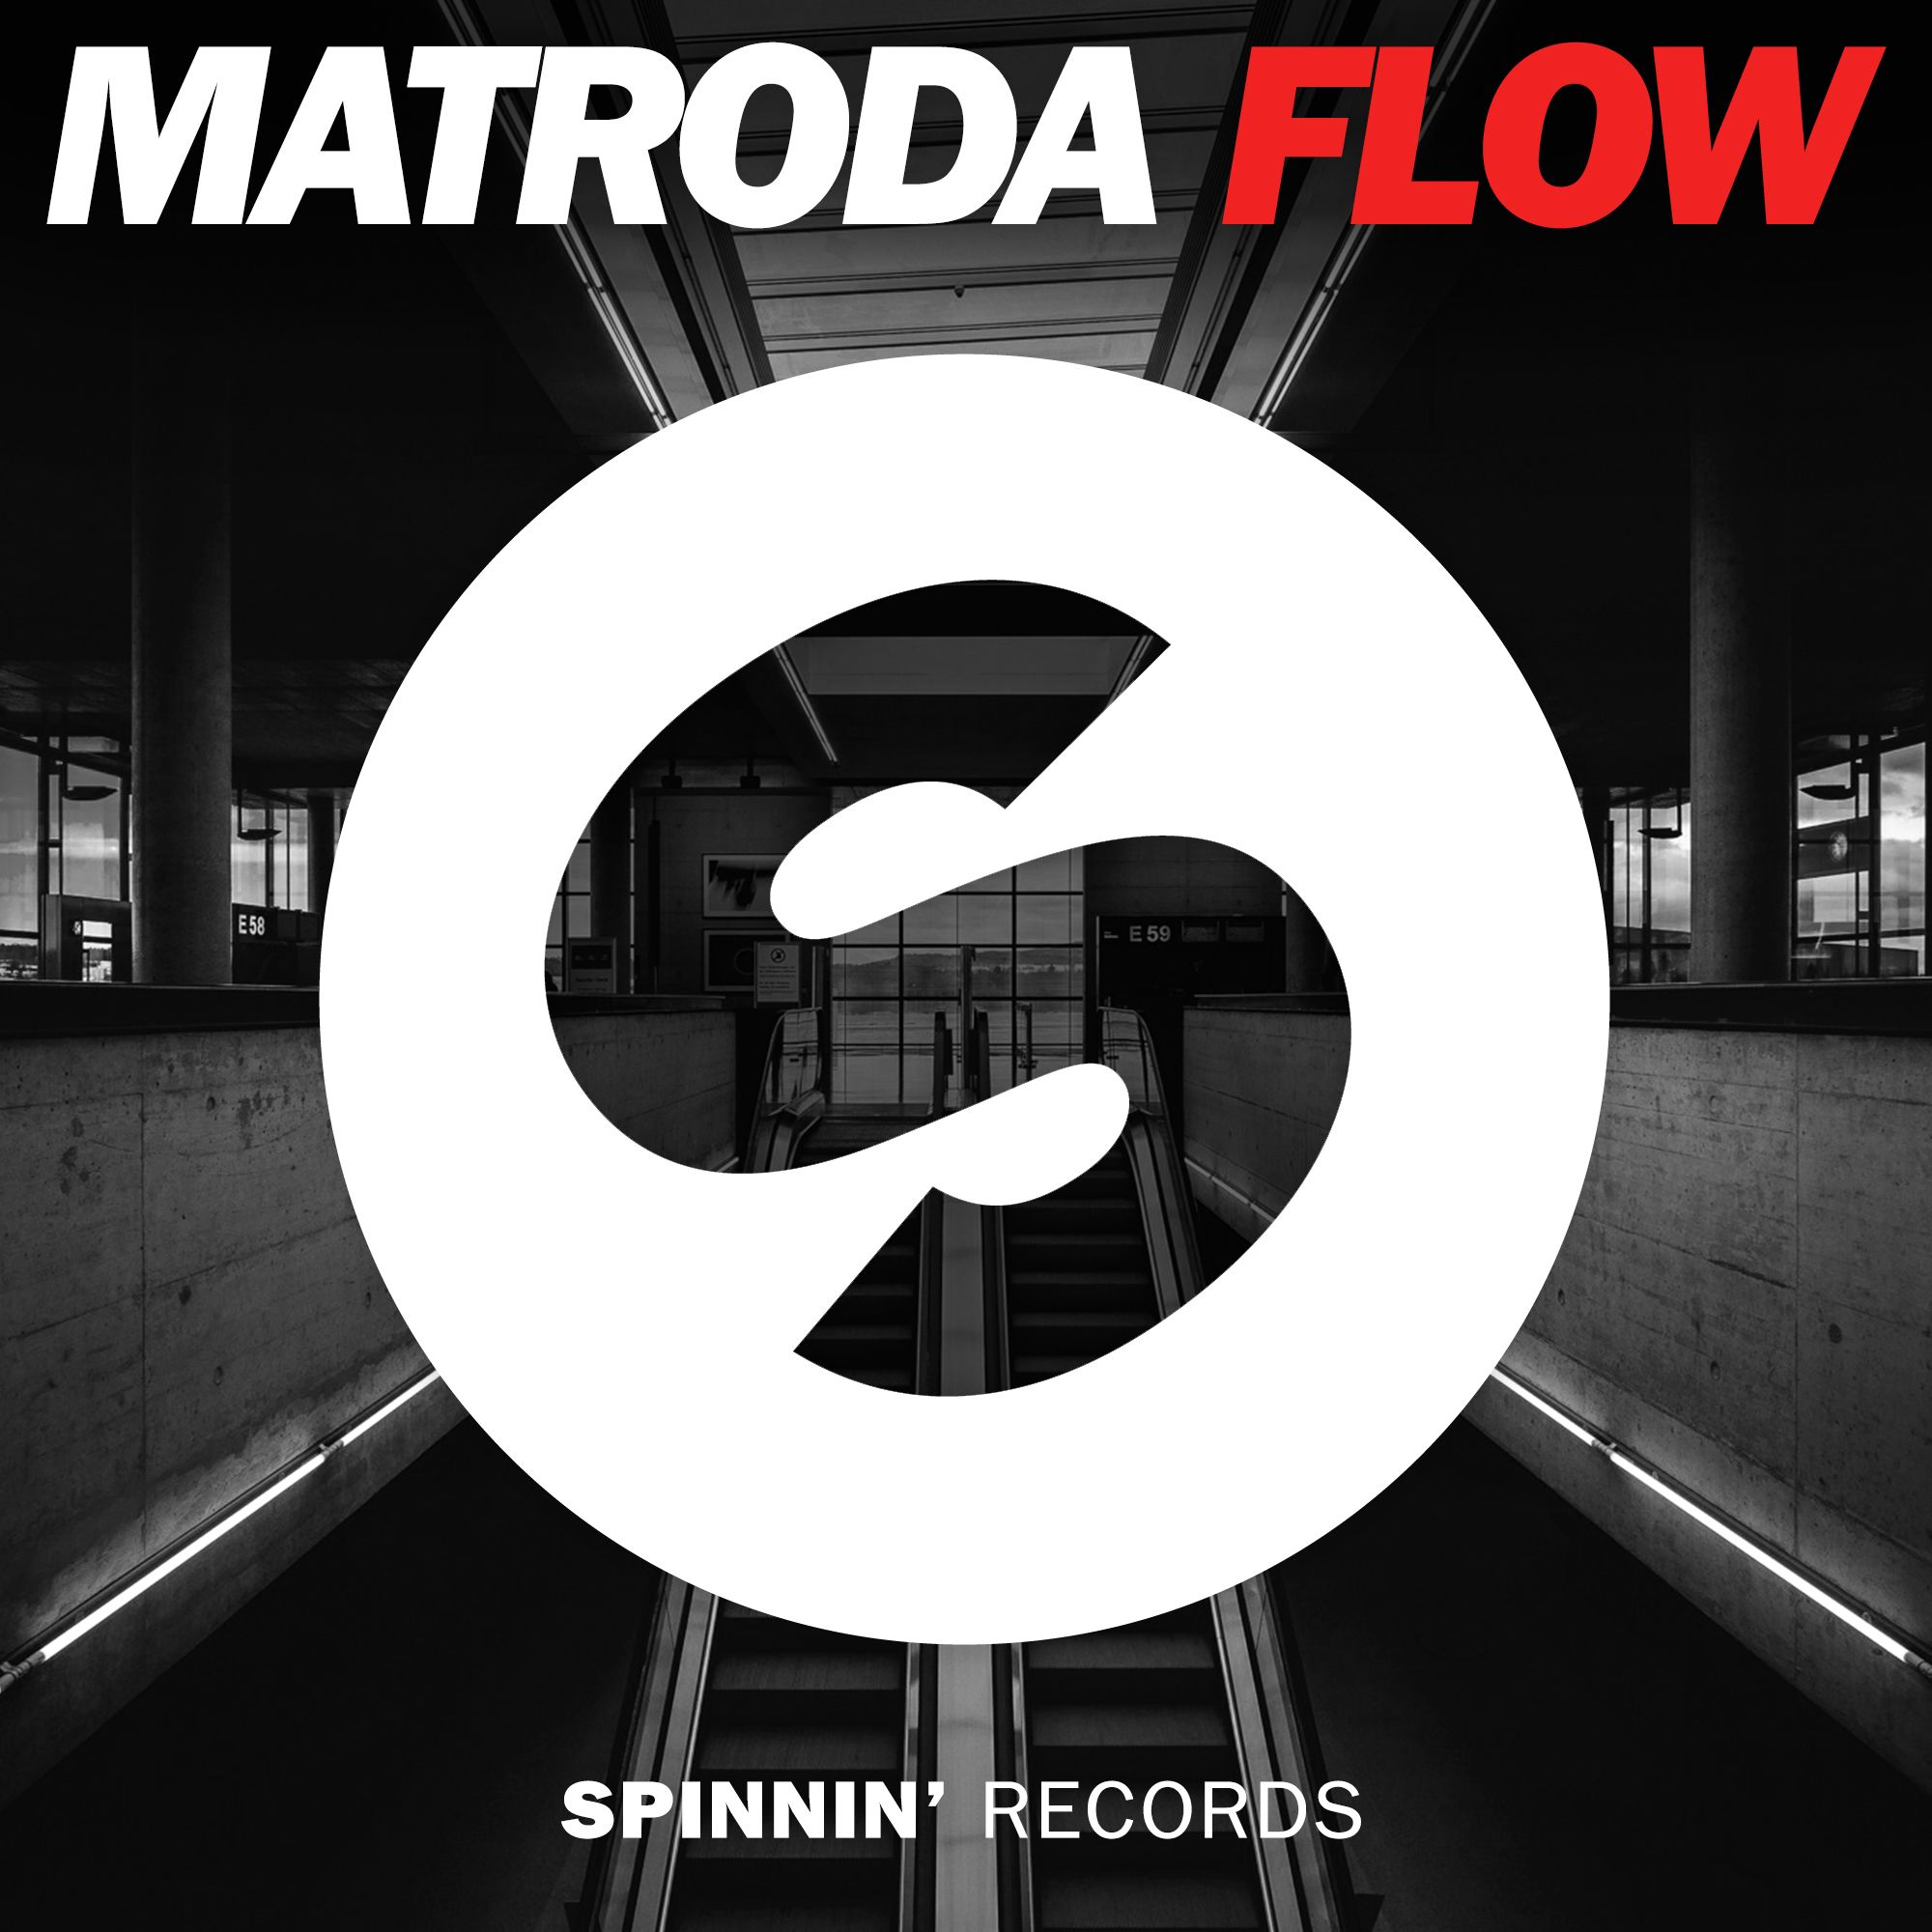 spinnin_matroda_-_flow.jpg